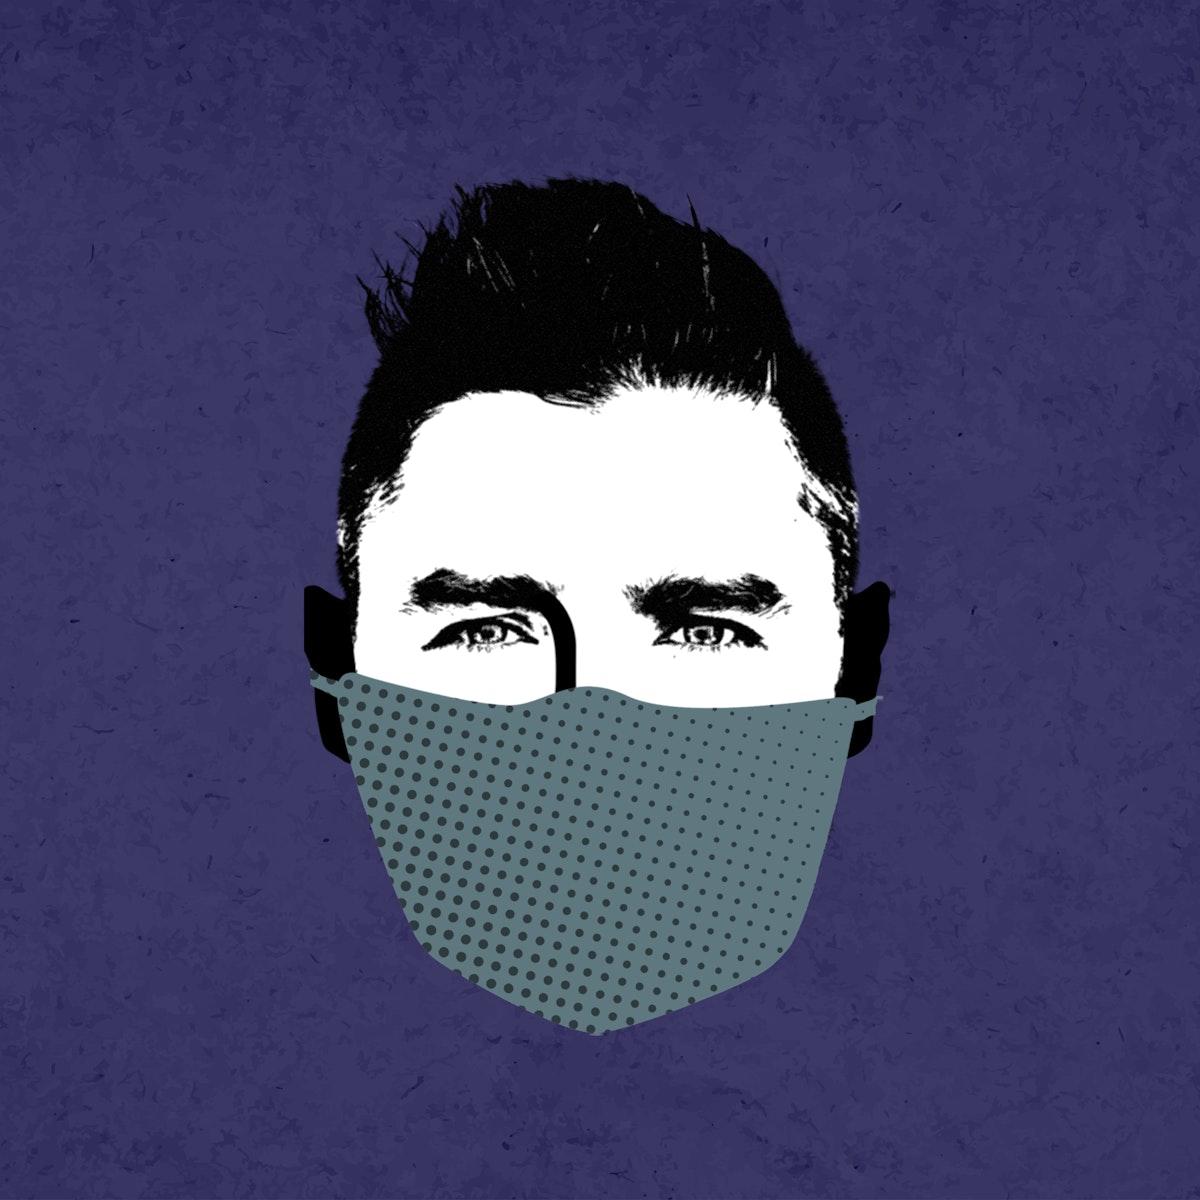 Man wearing a face mask during coronavirus pandemic mockup